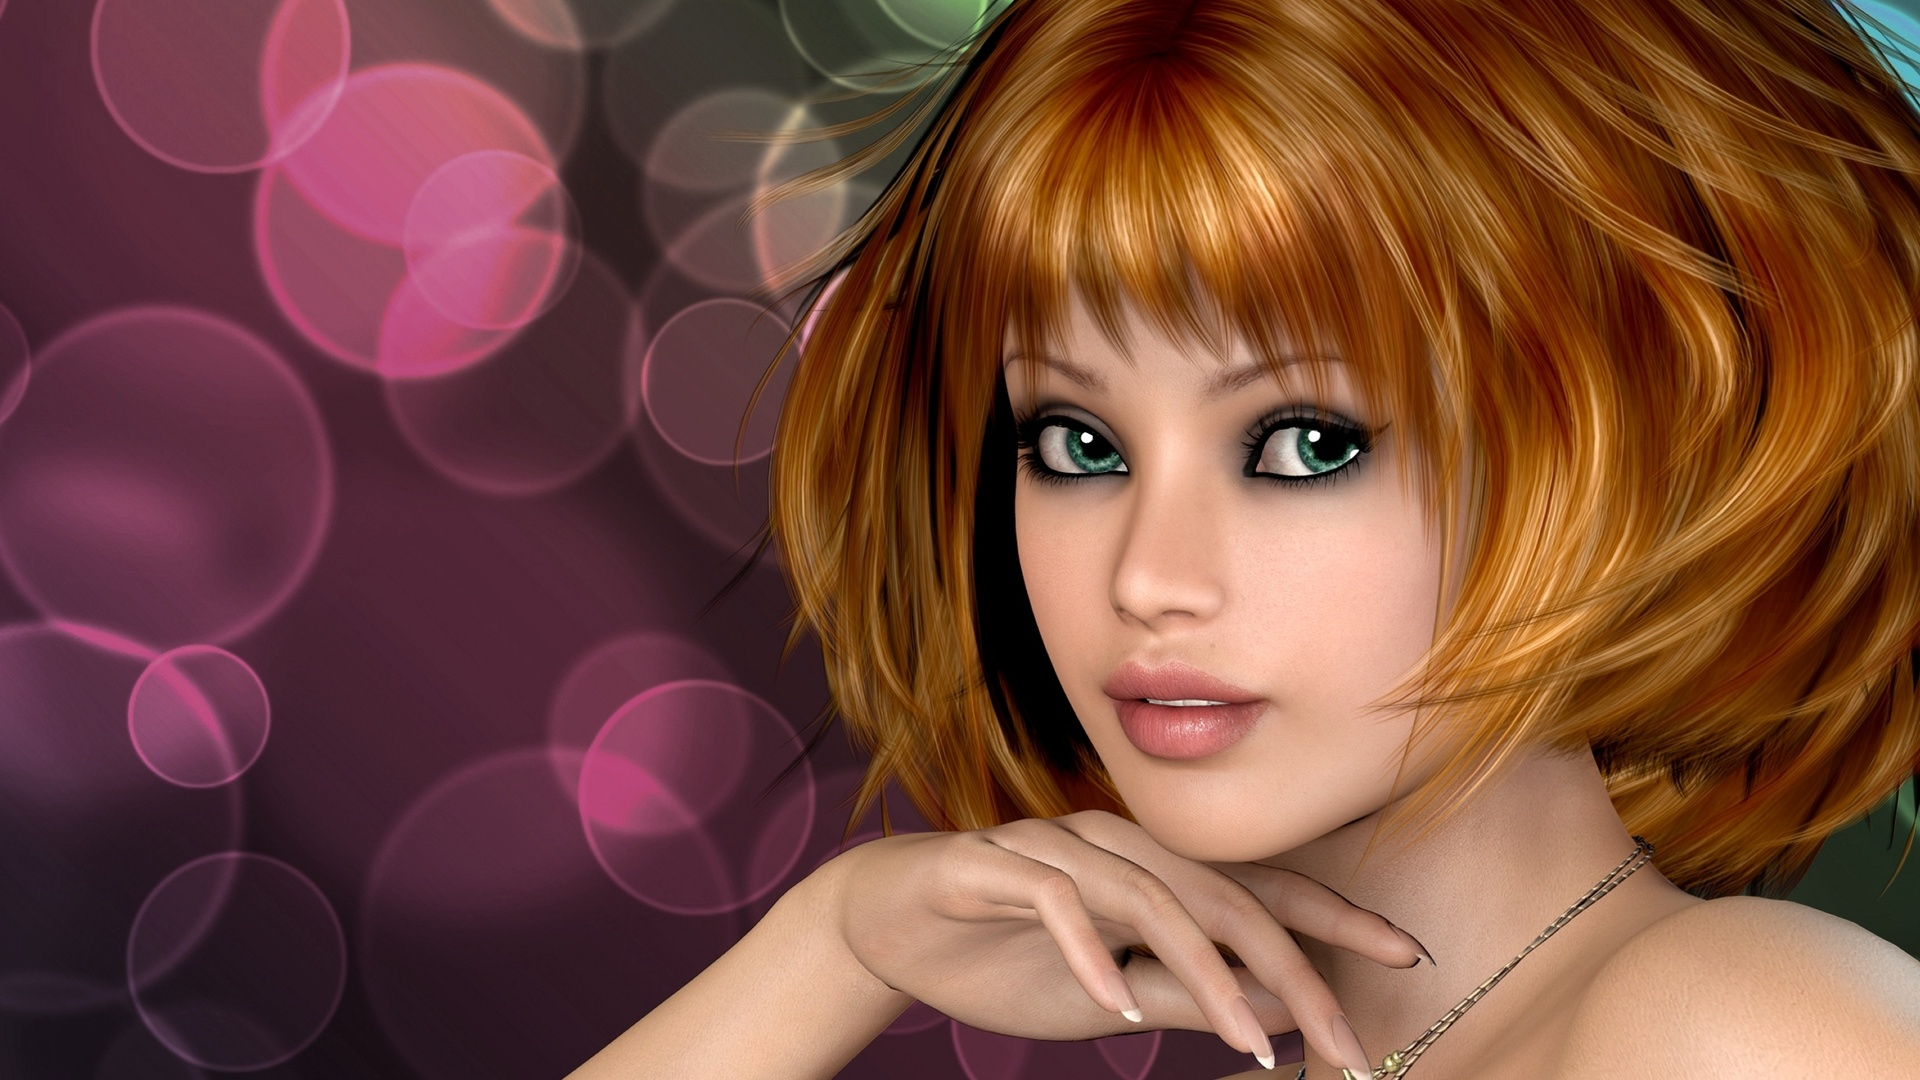 девушка, рыжая, глаза